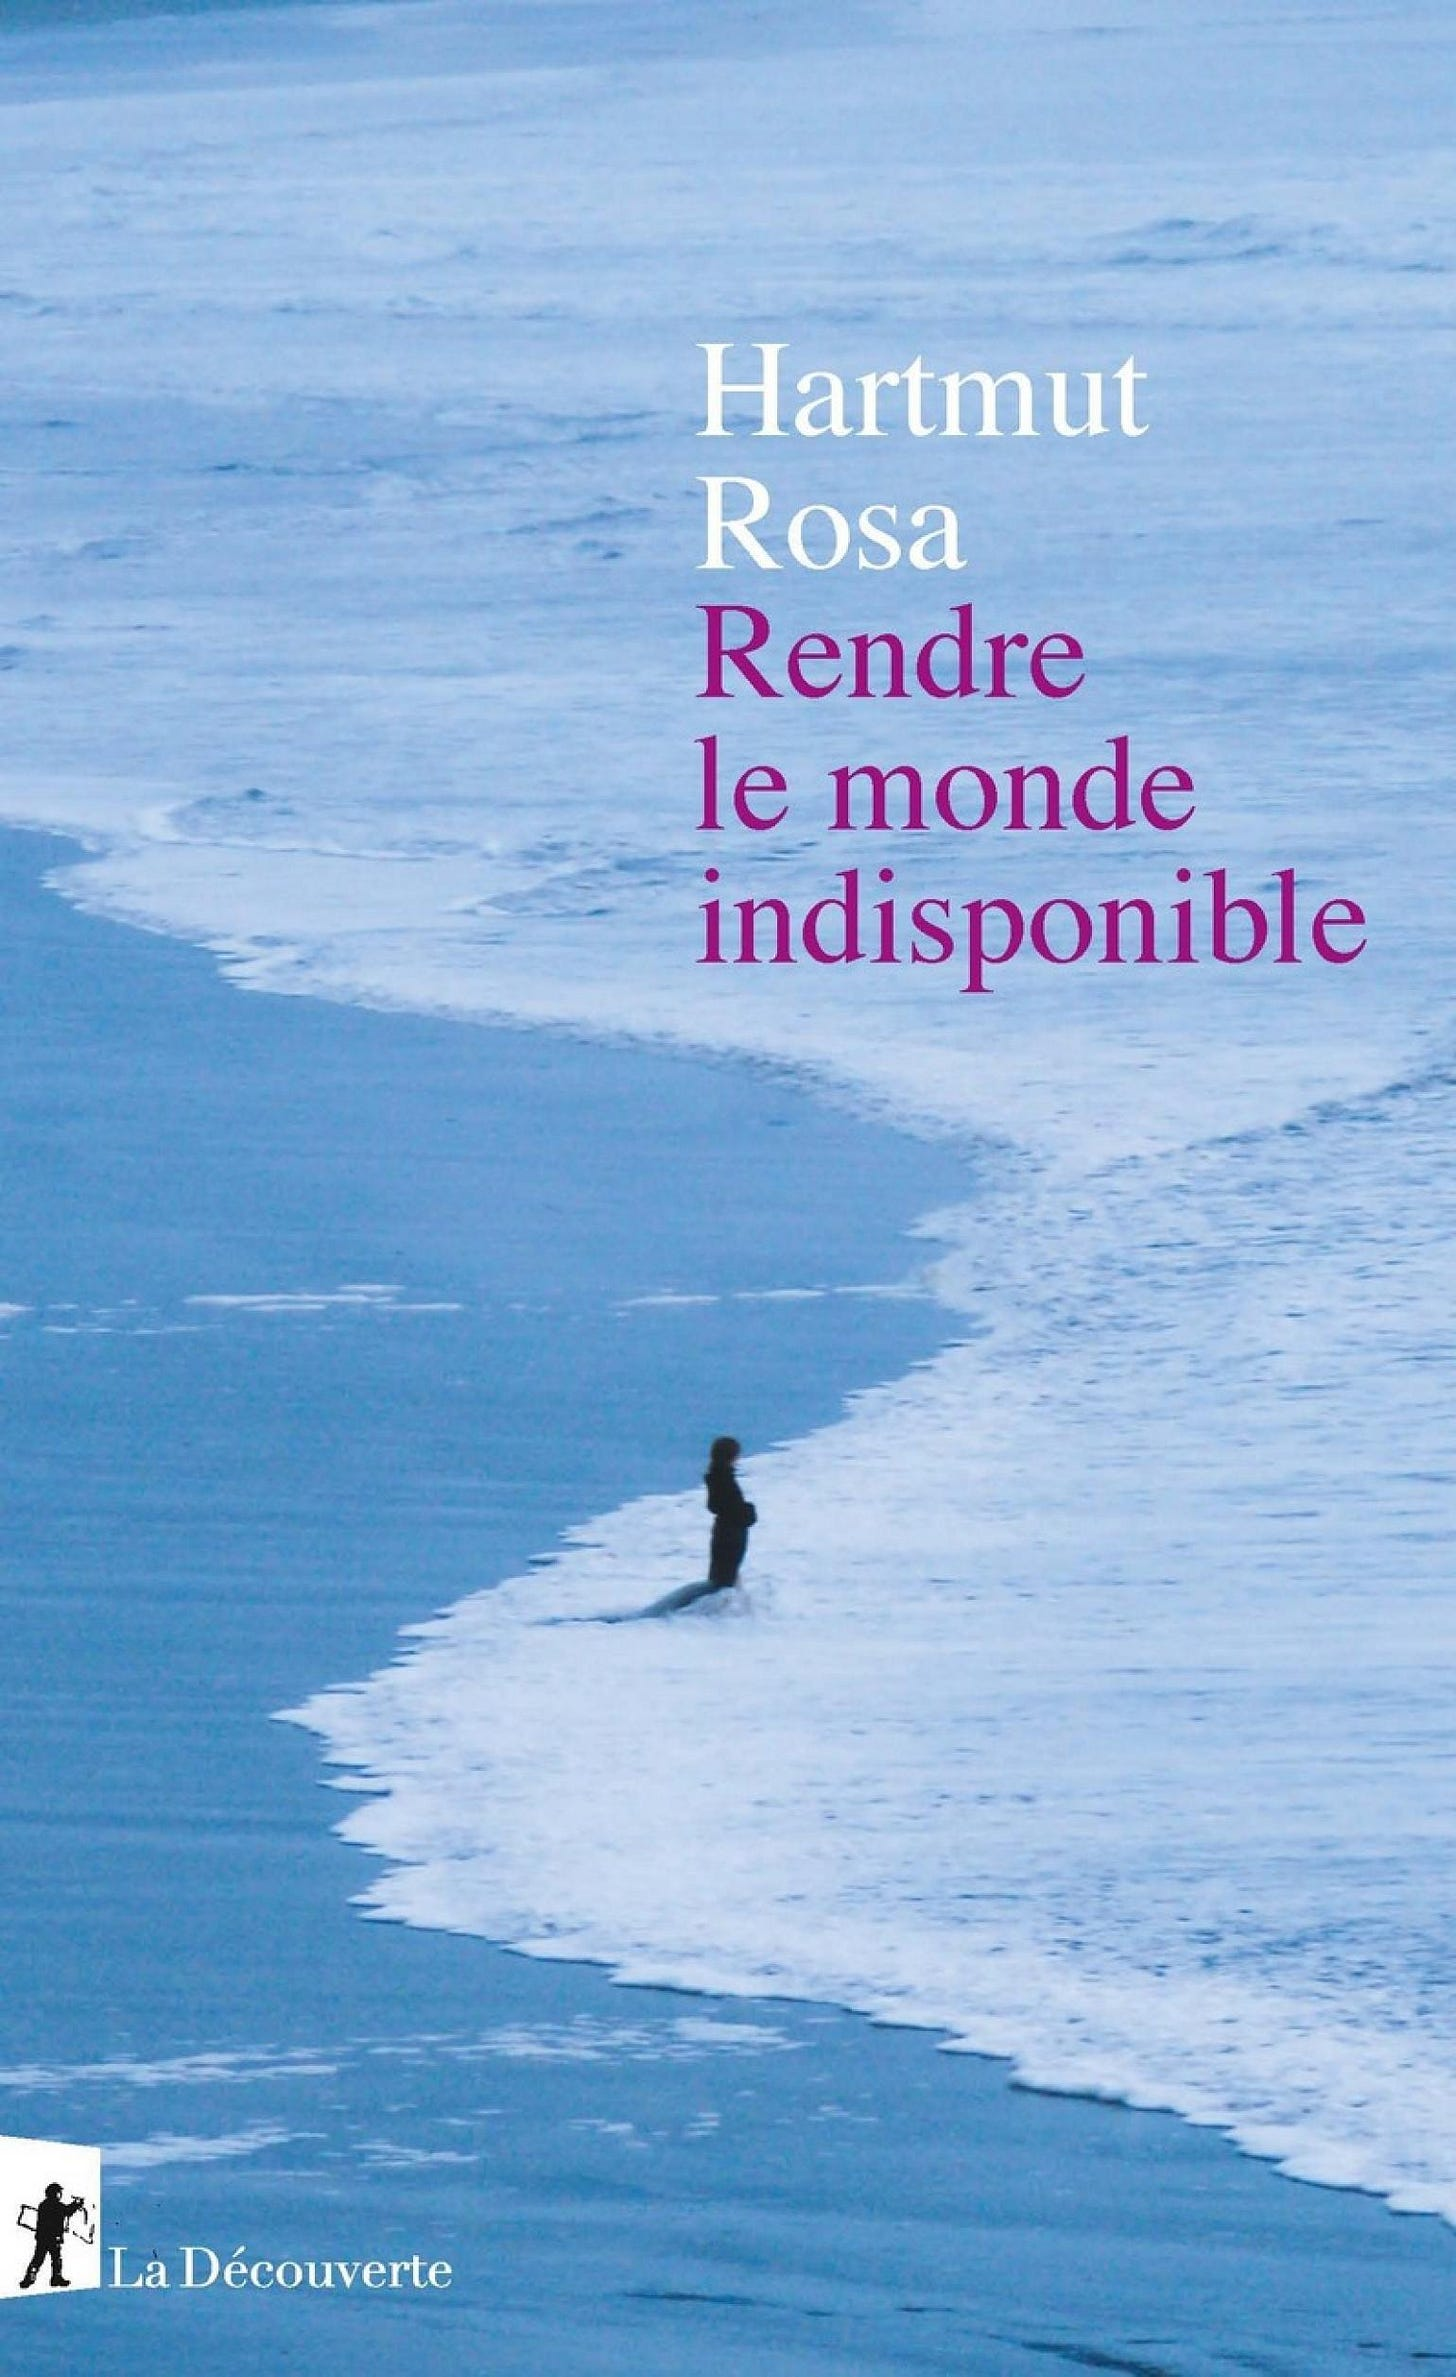 Rendre le monde indisponible de Hartmut Rosa | Revue Esprit